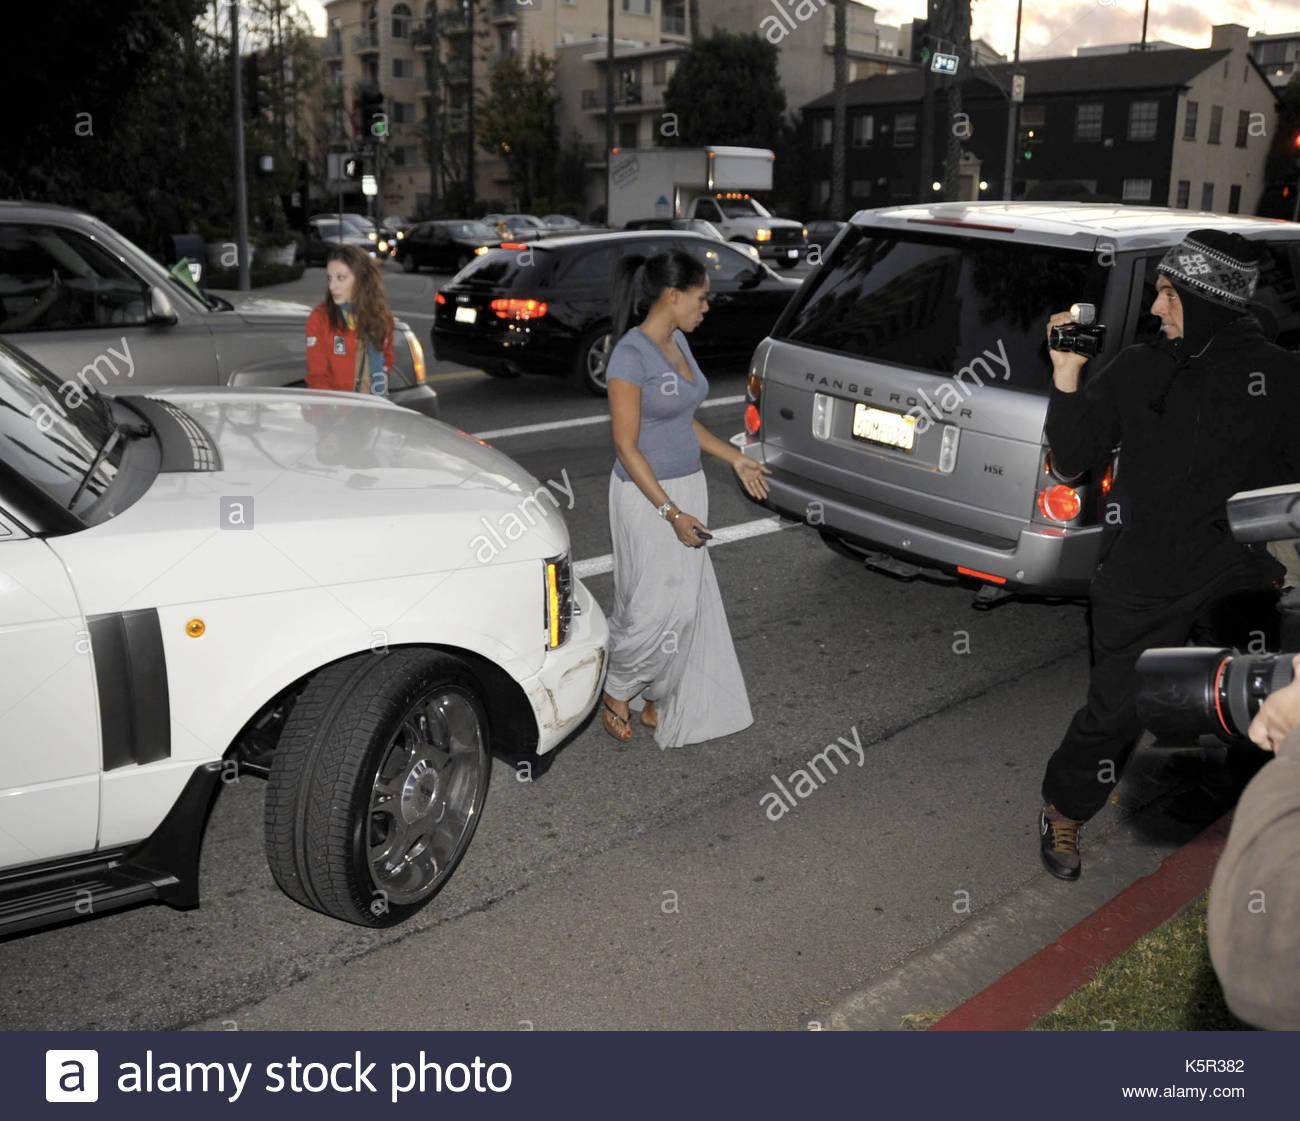 Minor Car Accident Stock Photos & Minor Car Accident Stock